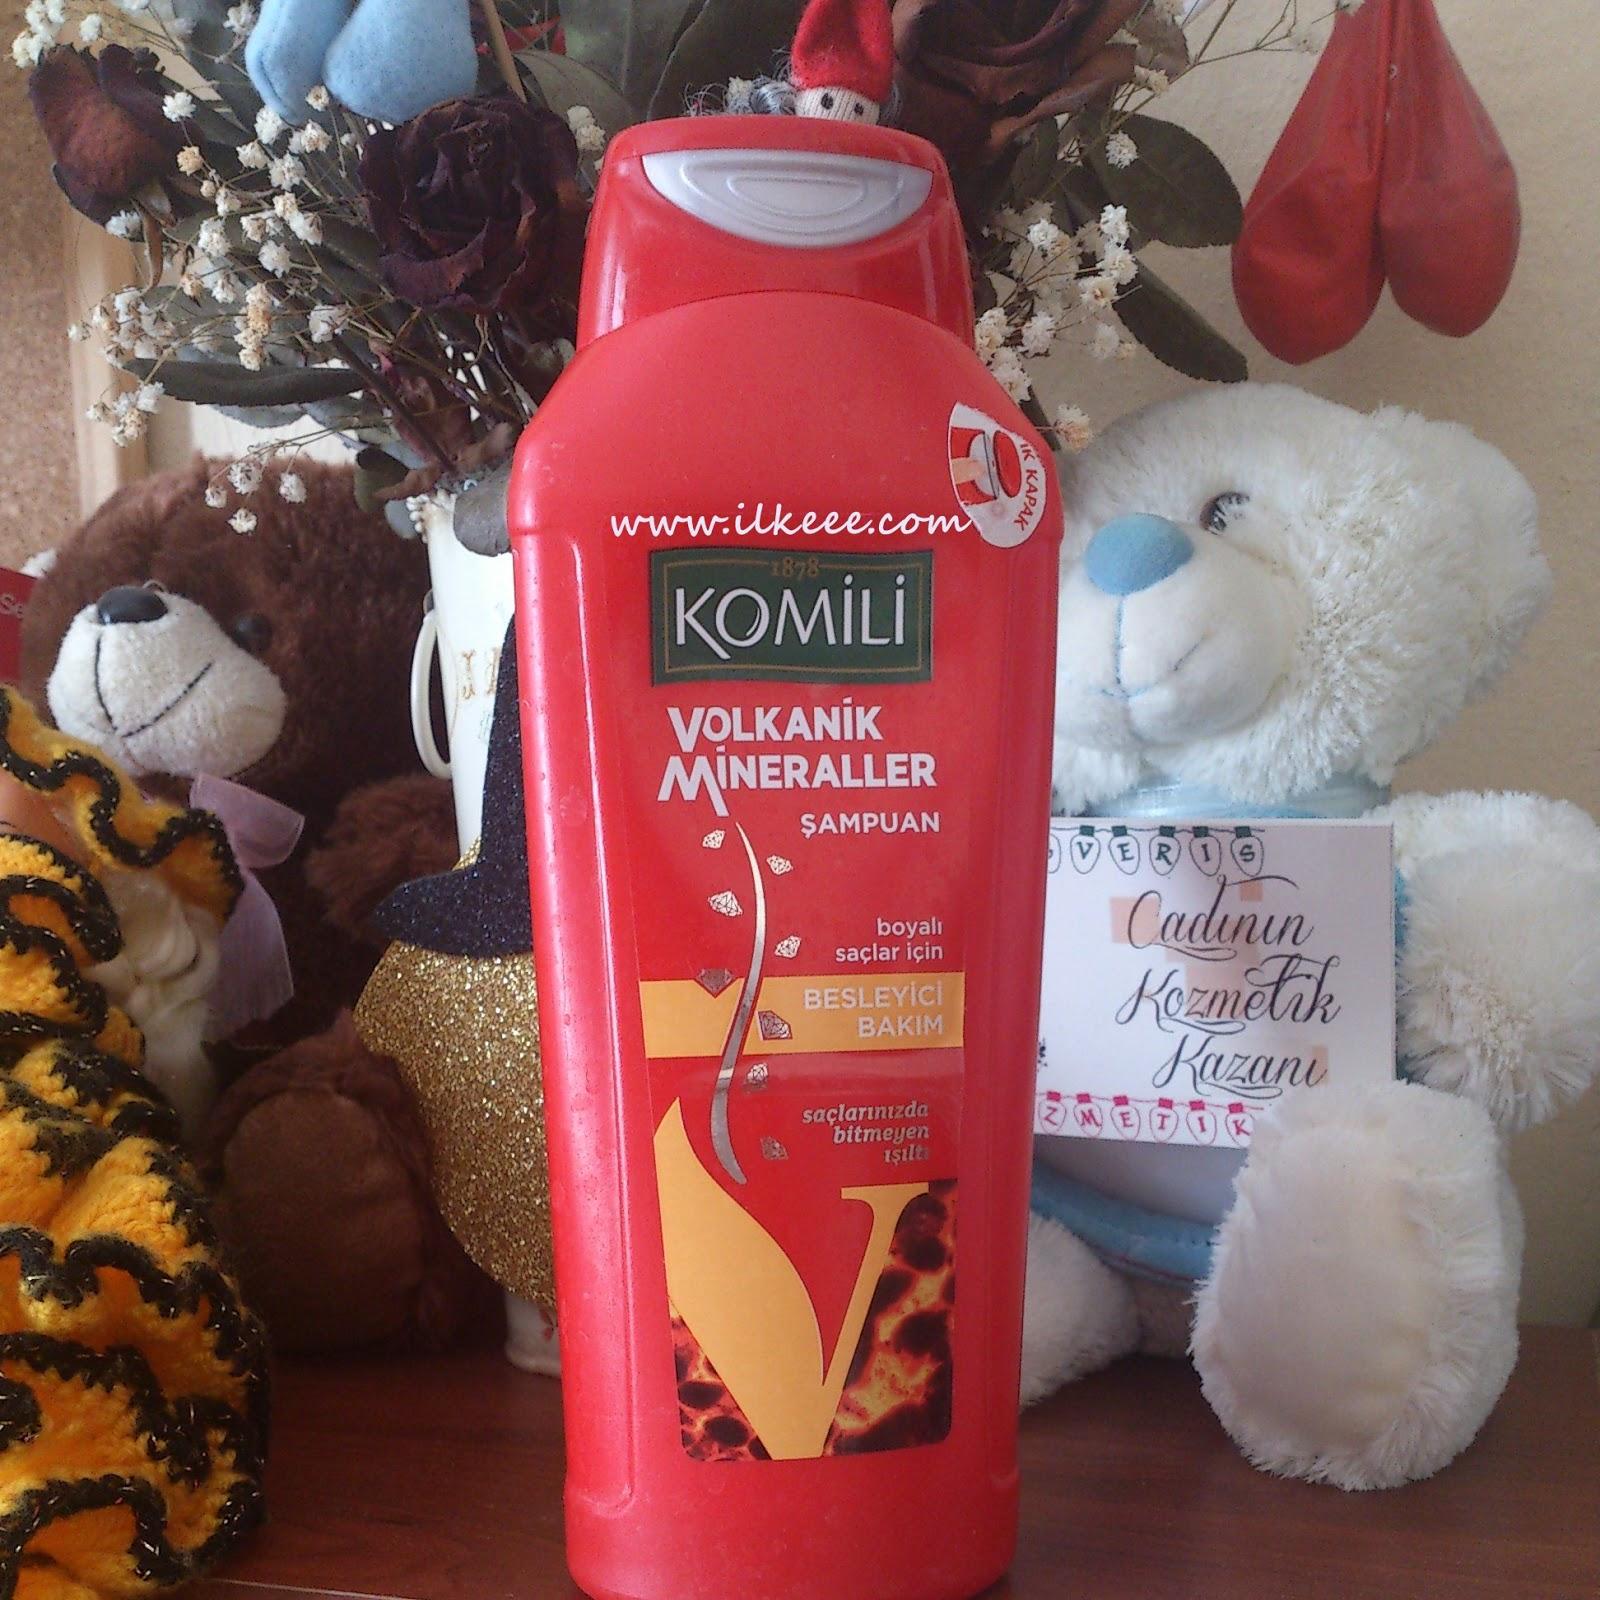 Komili Volkanik Mineraller Şampuanı- Komili-Besleyici Bakım